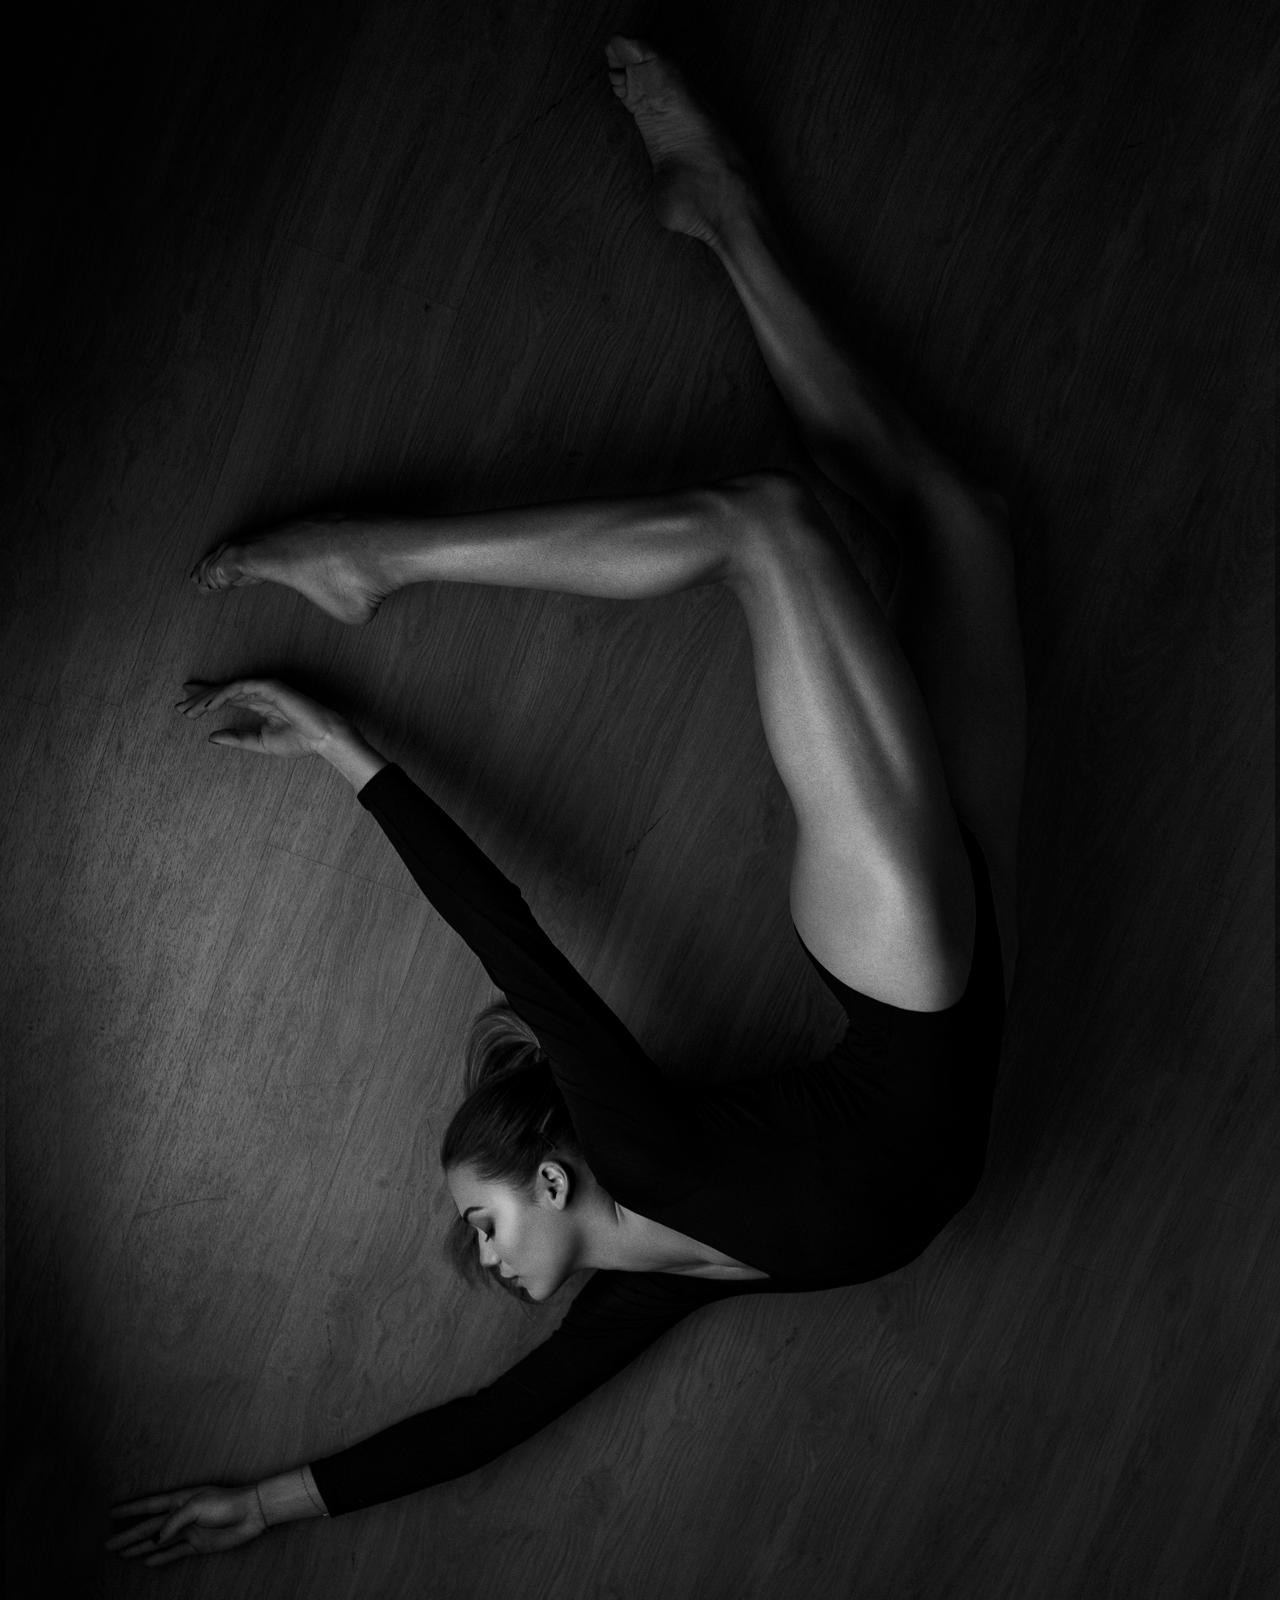 petyaborisova-thebodyportrait-7321-ME.png